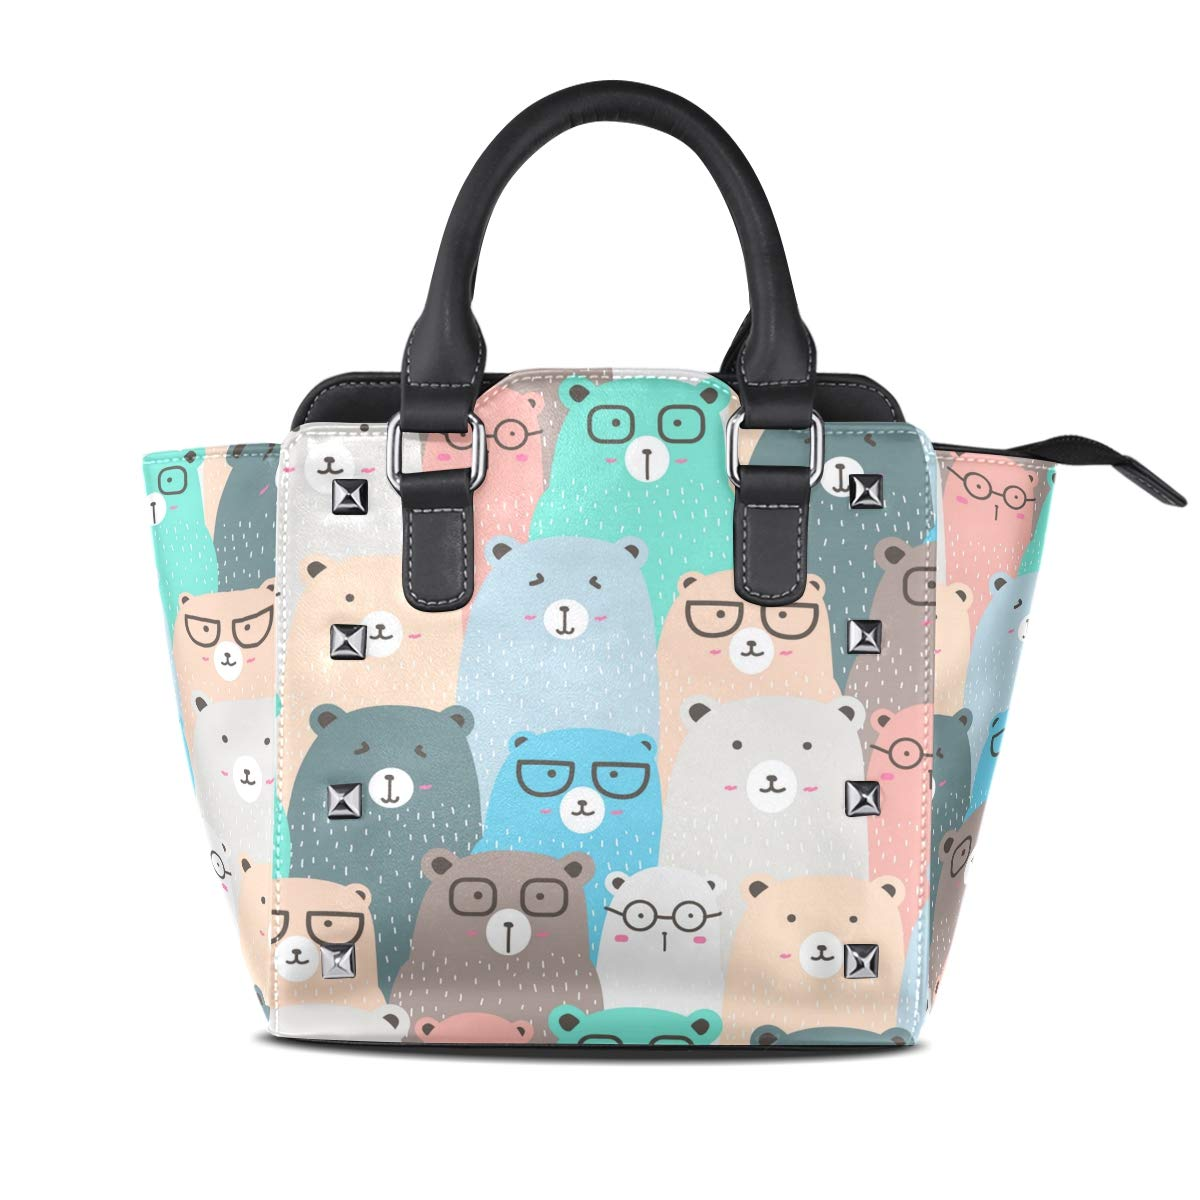 Design3 Handbag Beautiful Butterfly Genuine Leather Tote Rivet Bag Shoulder Strap Top Handle Women